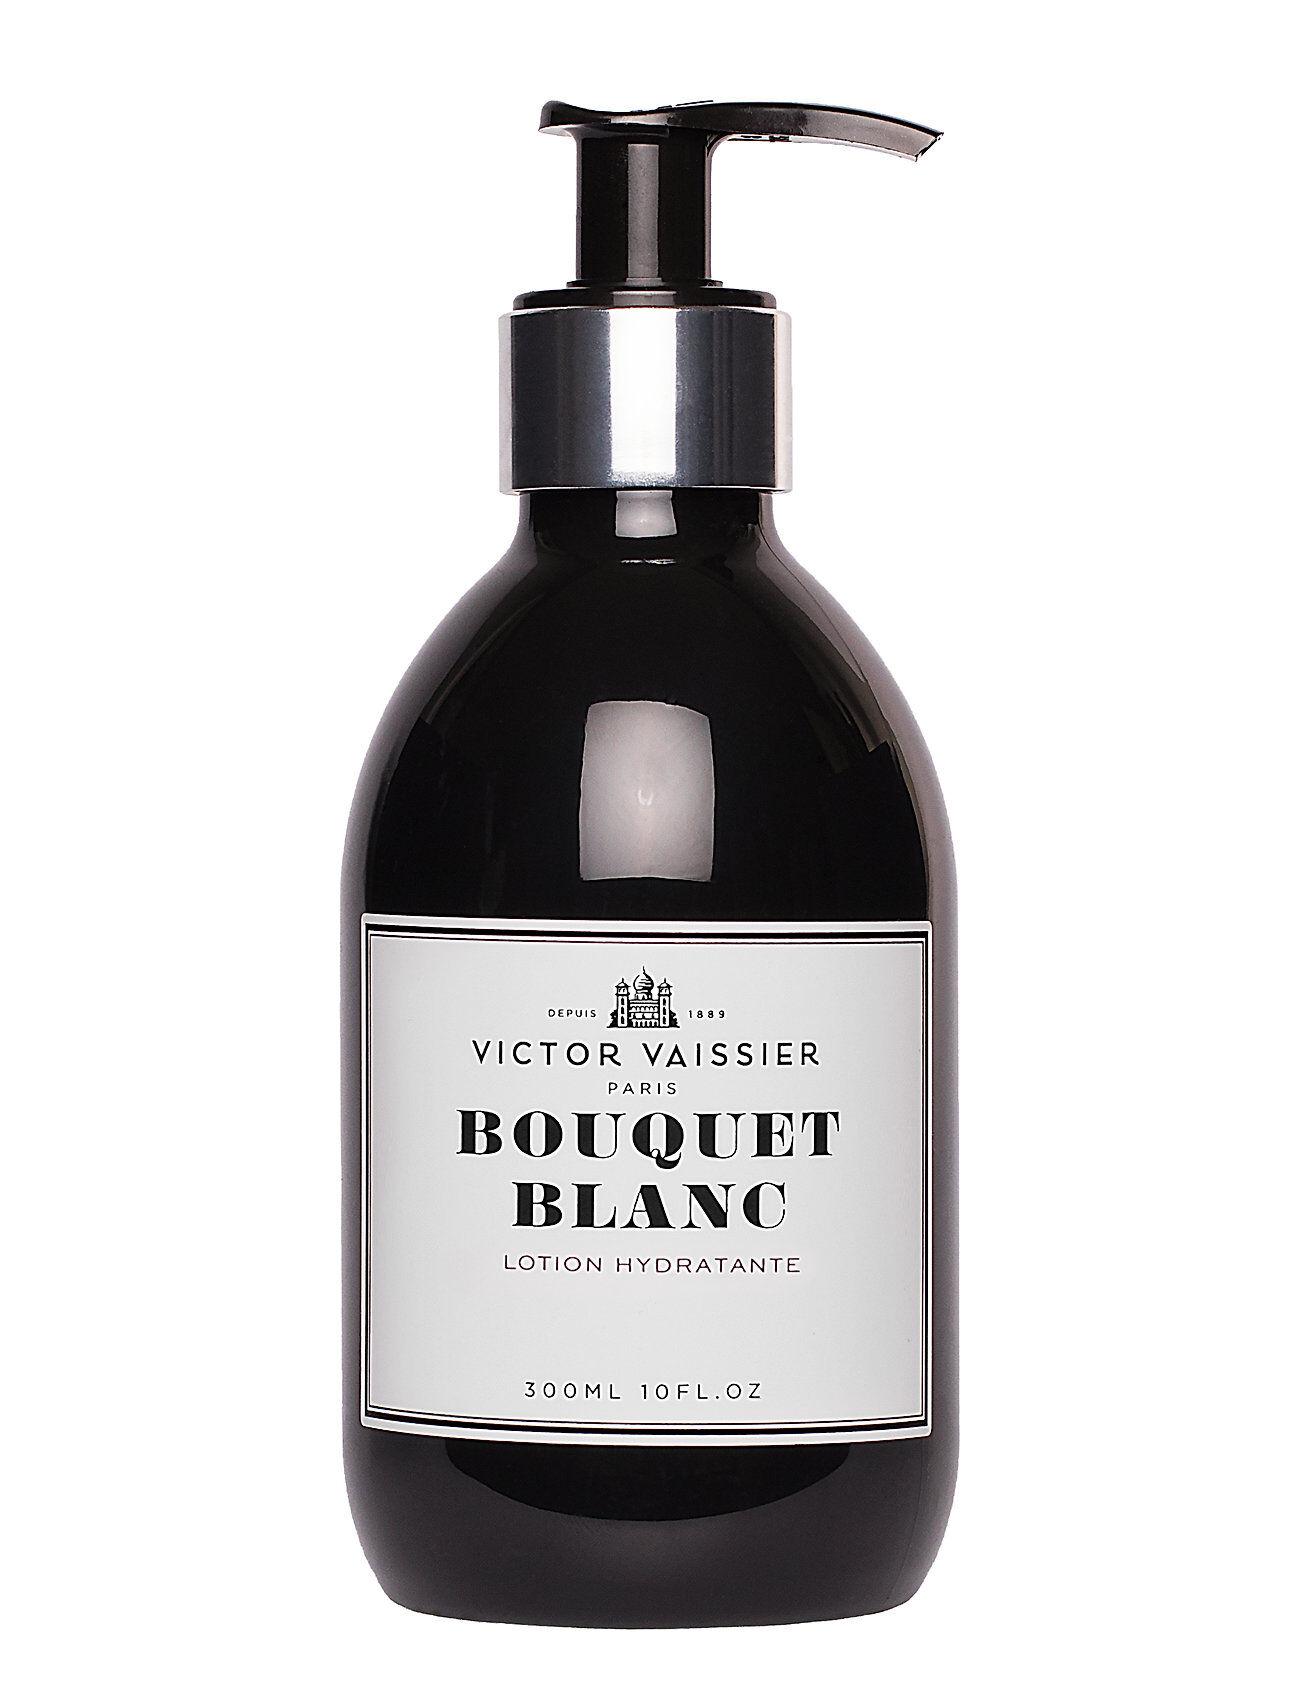 Victor Vaissier Hydrating Lotion Bouquet Blanc Kosteusvoide Vartalo Nude Victor Vaissier